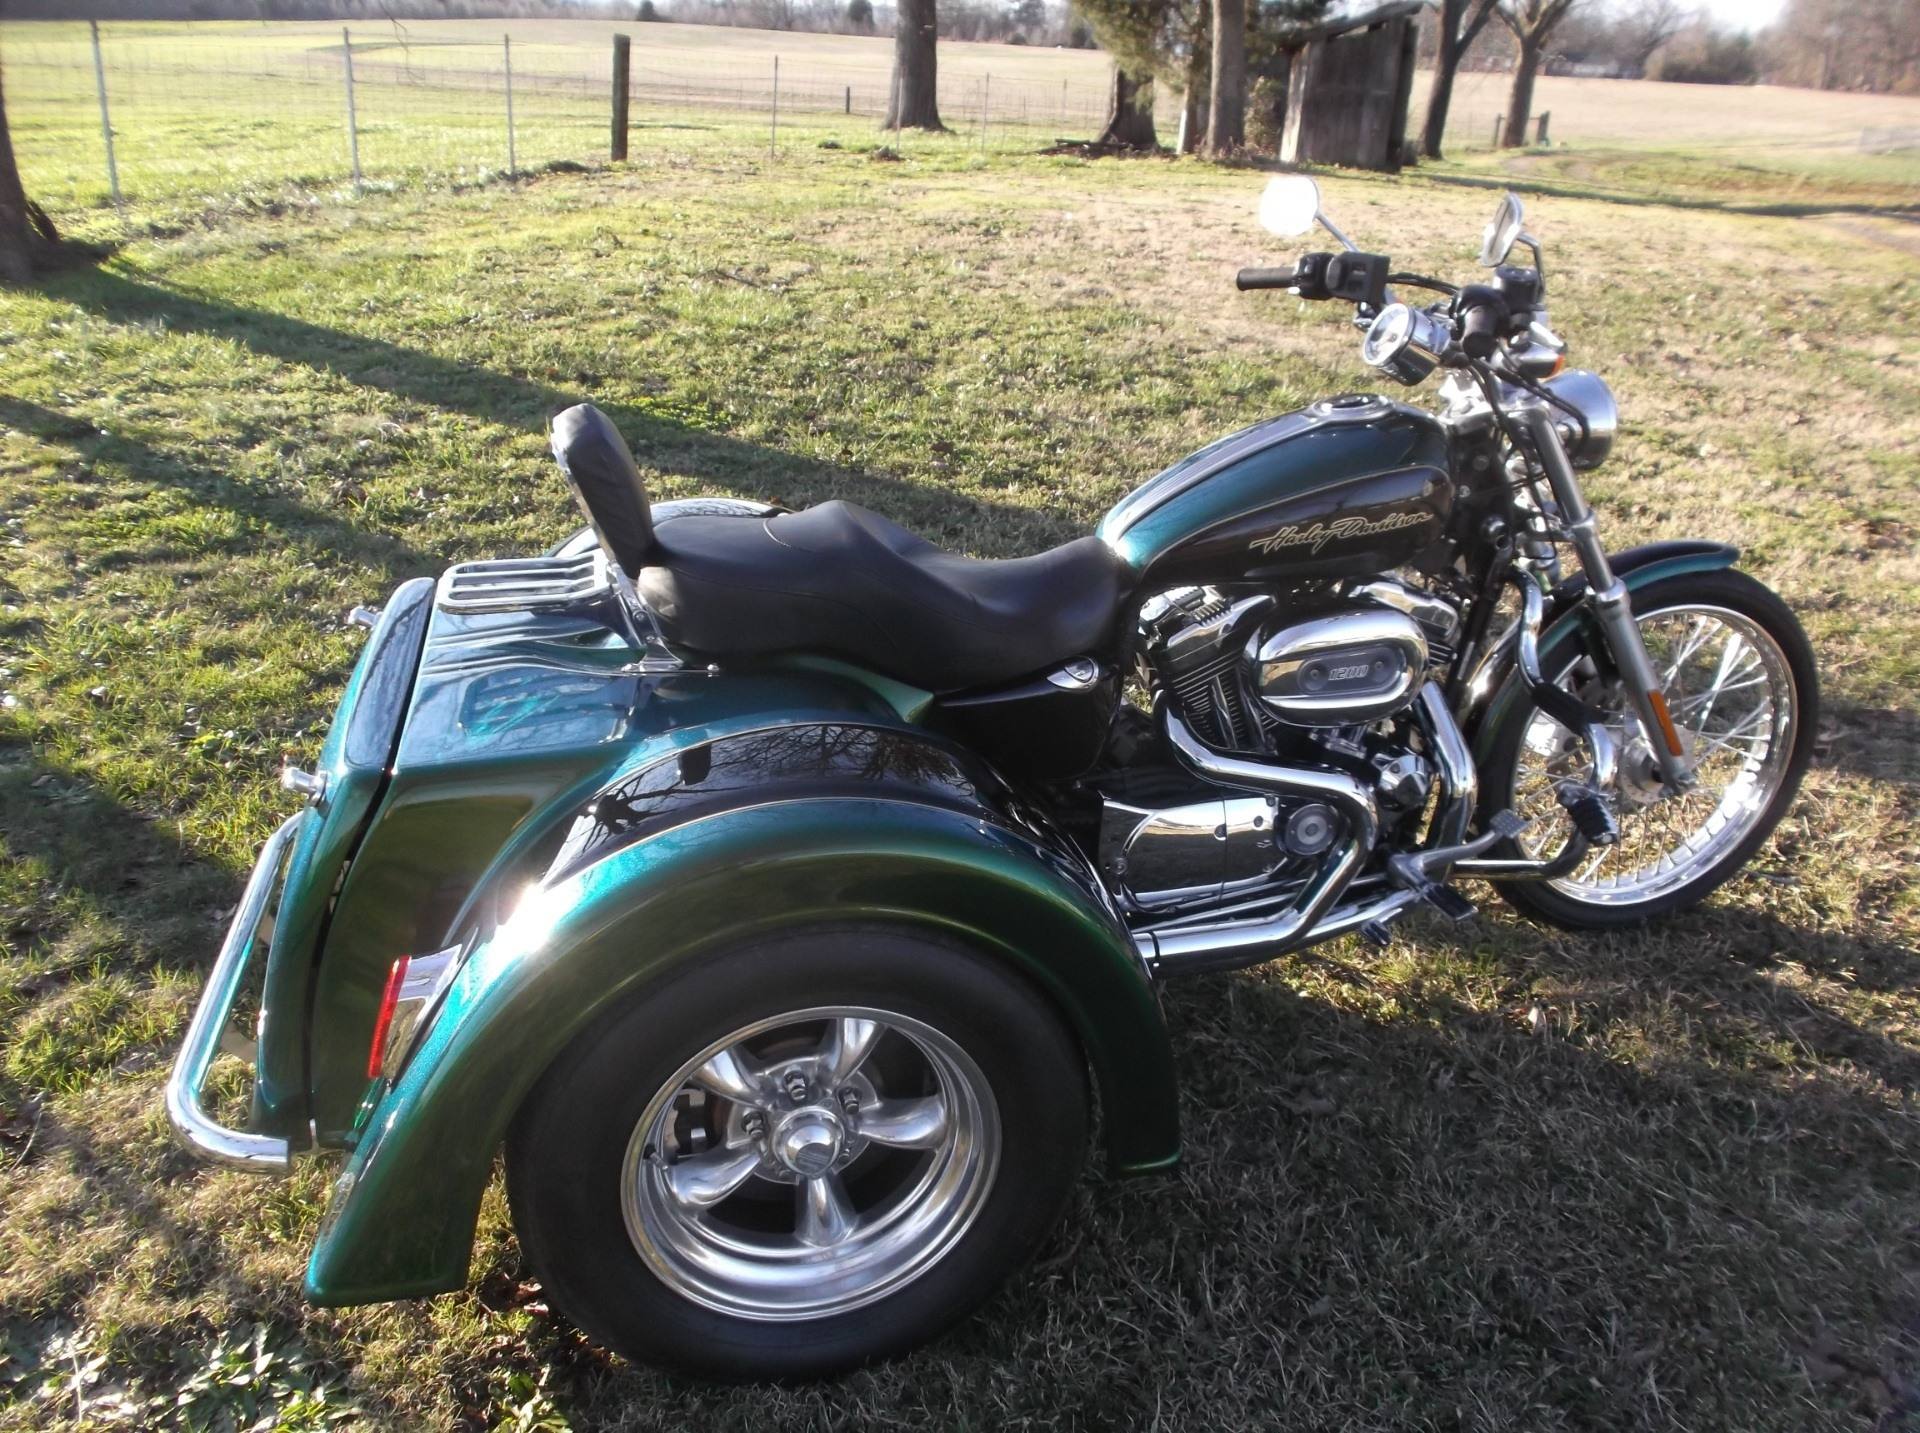 2006 Harley-Davidson XL1200 MOTORTRIKE 5